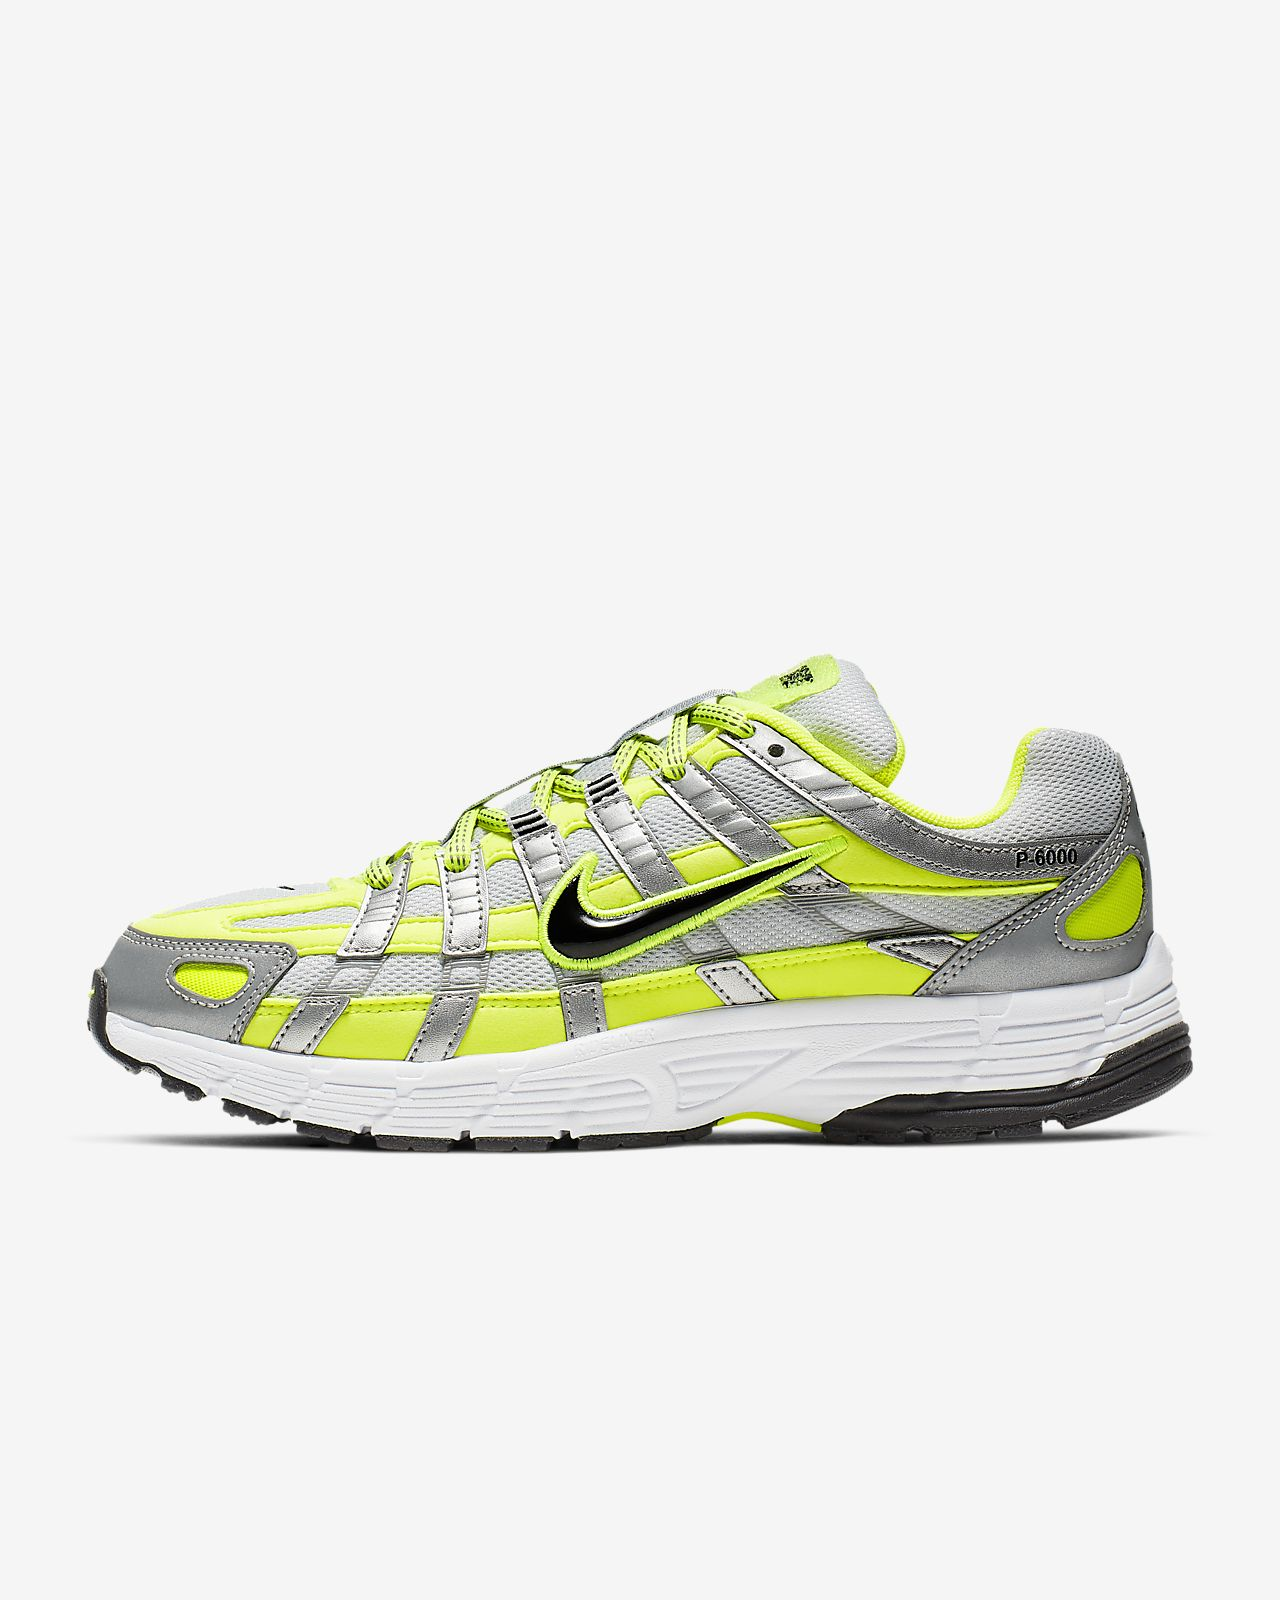 Dámská bota Nike P-6000 Concept